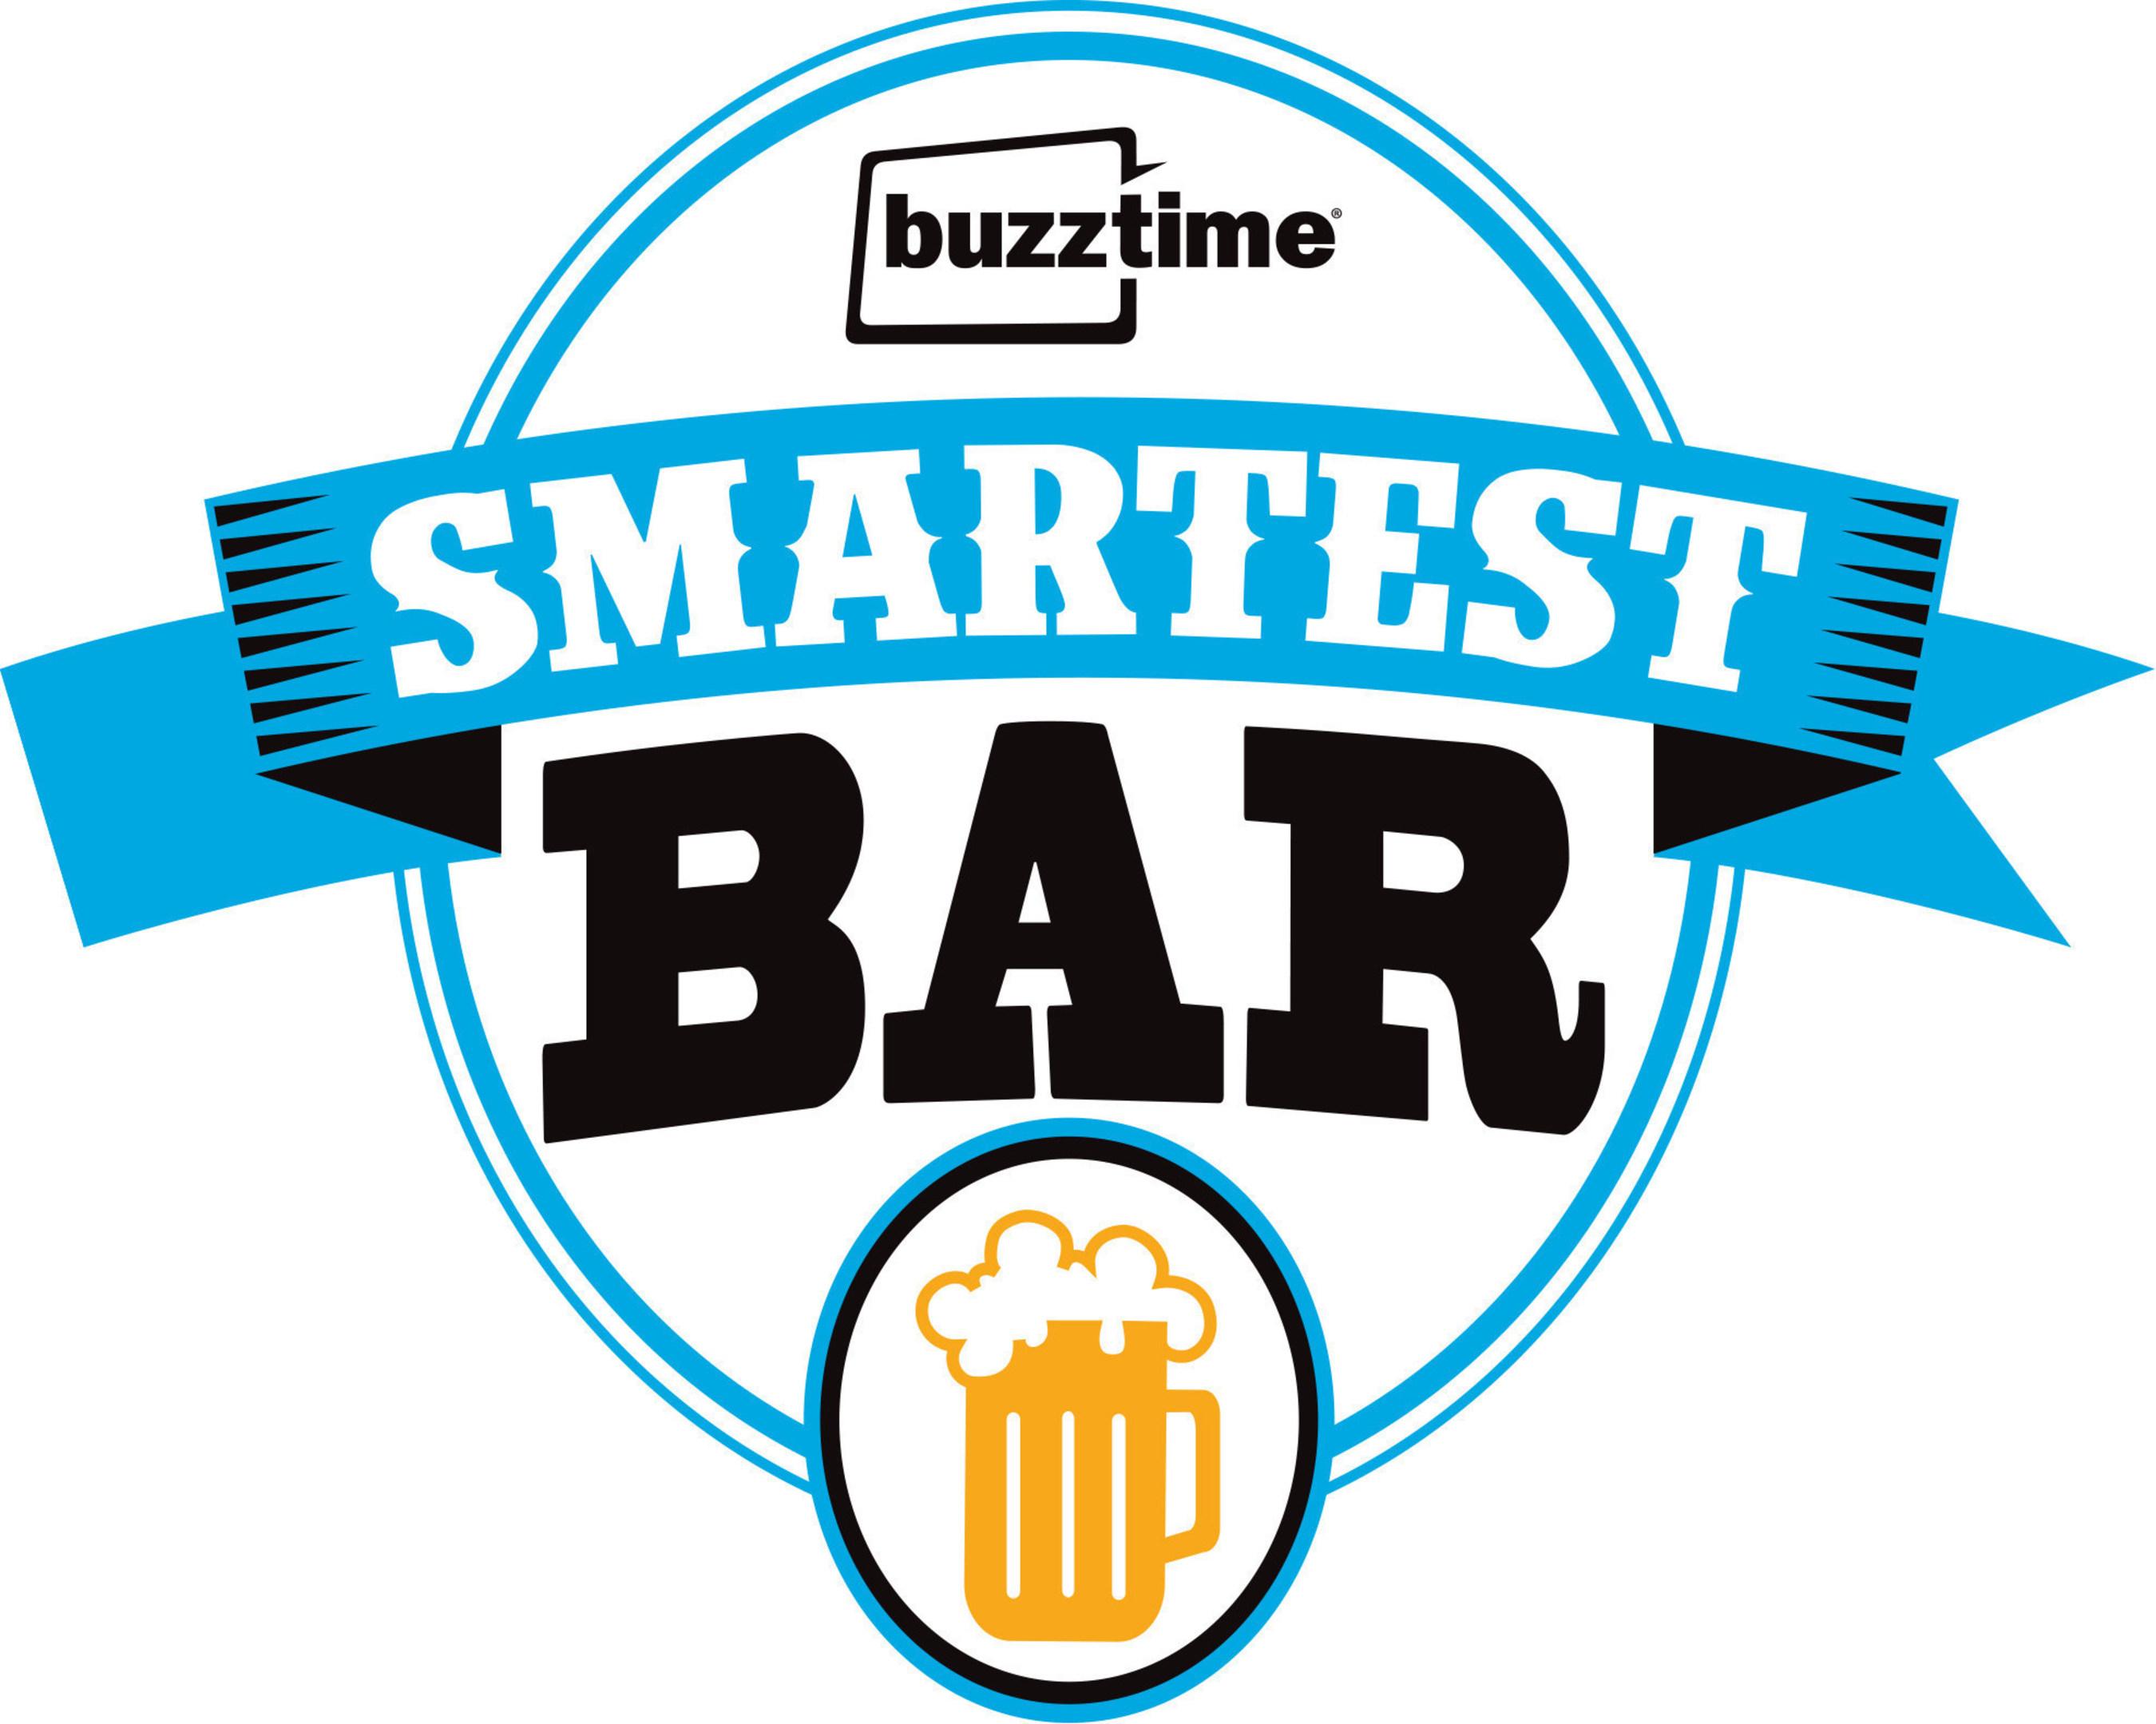 Buzztime Announces The Concert Pub as the Smartest Bar in America